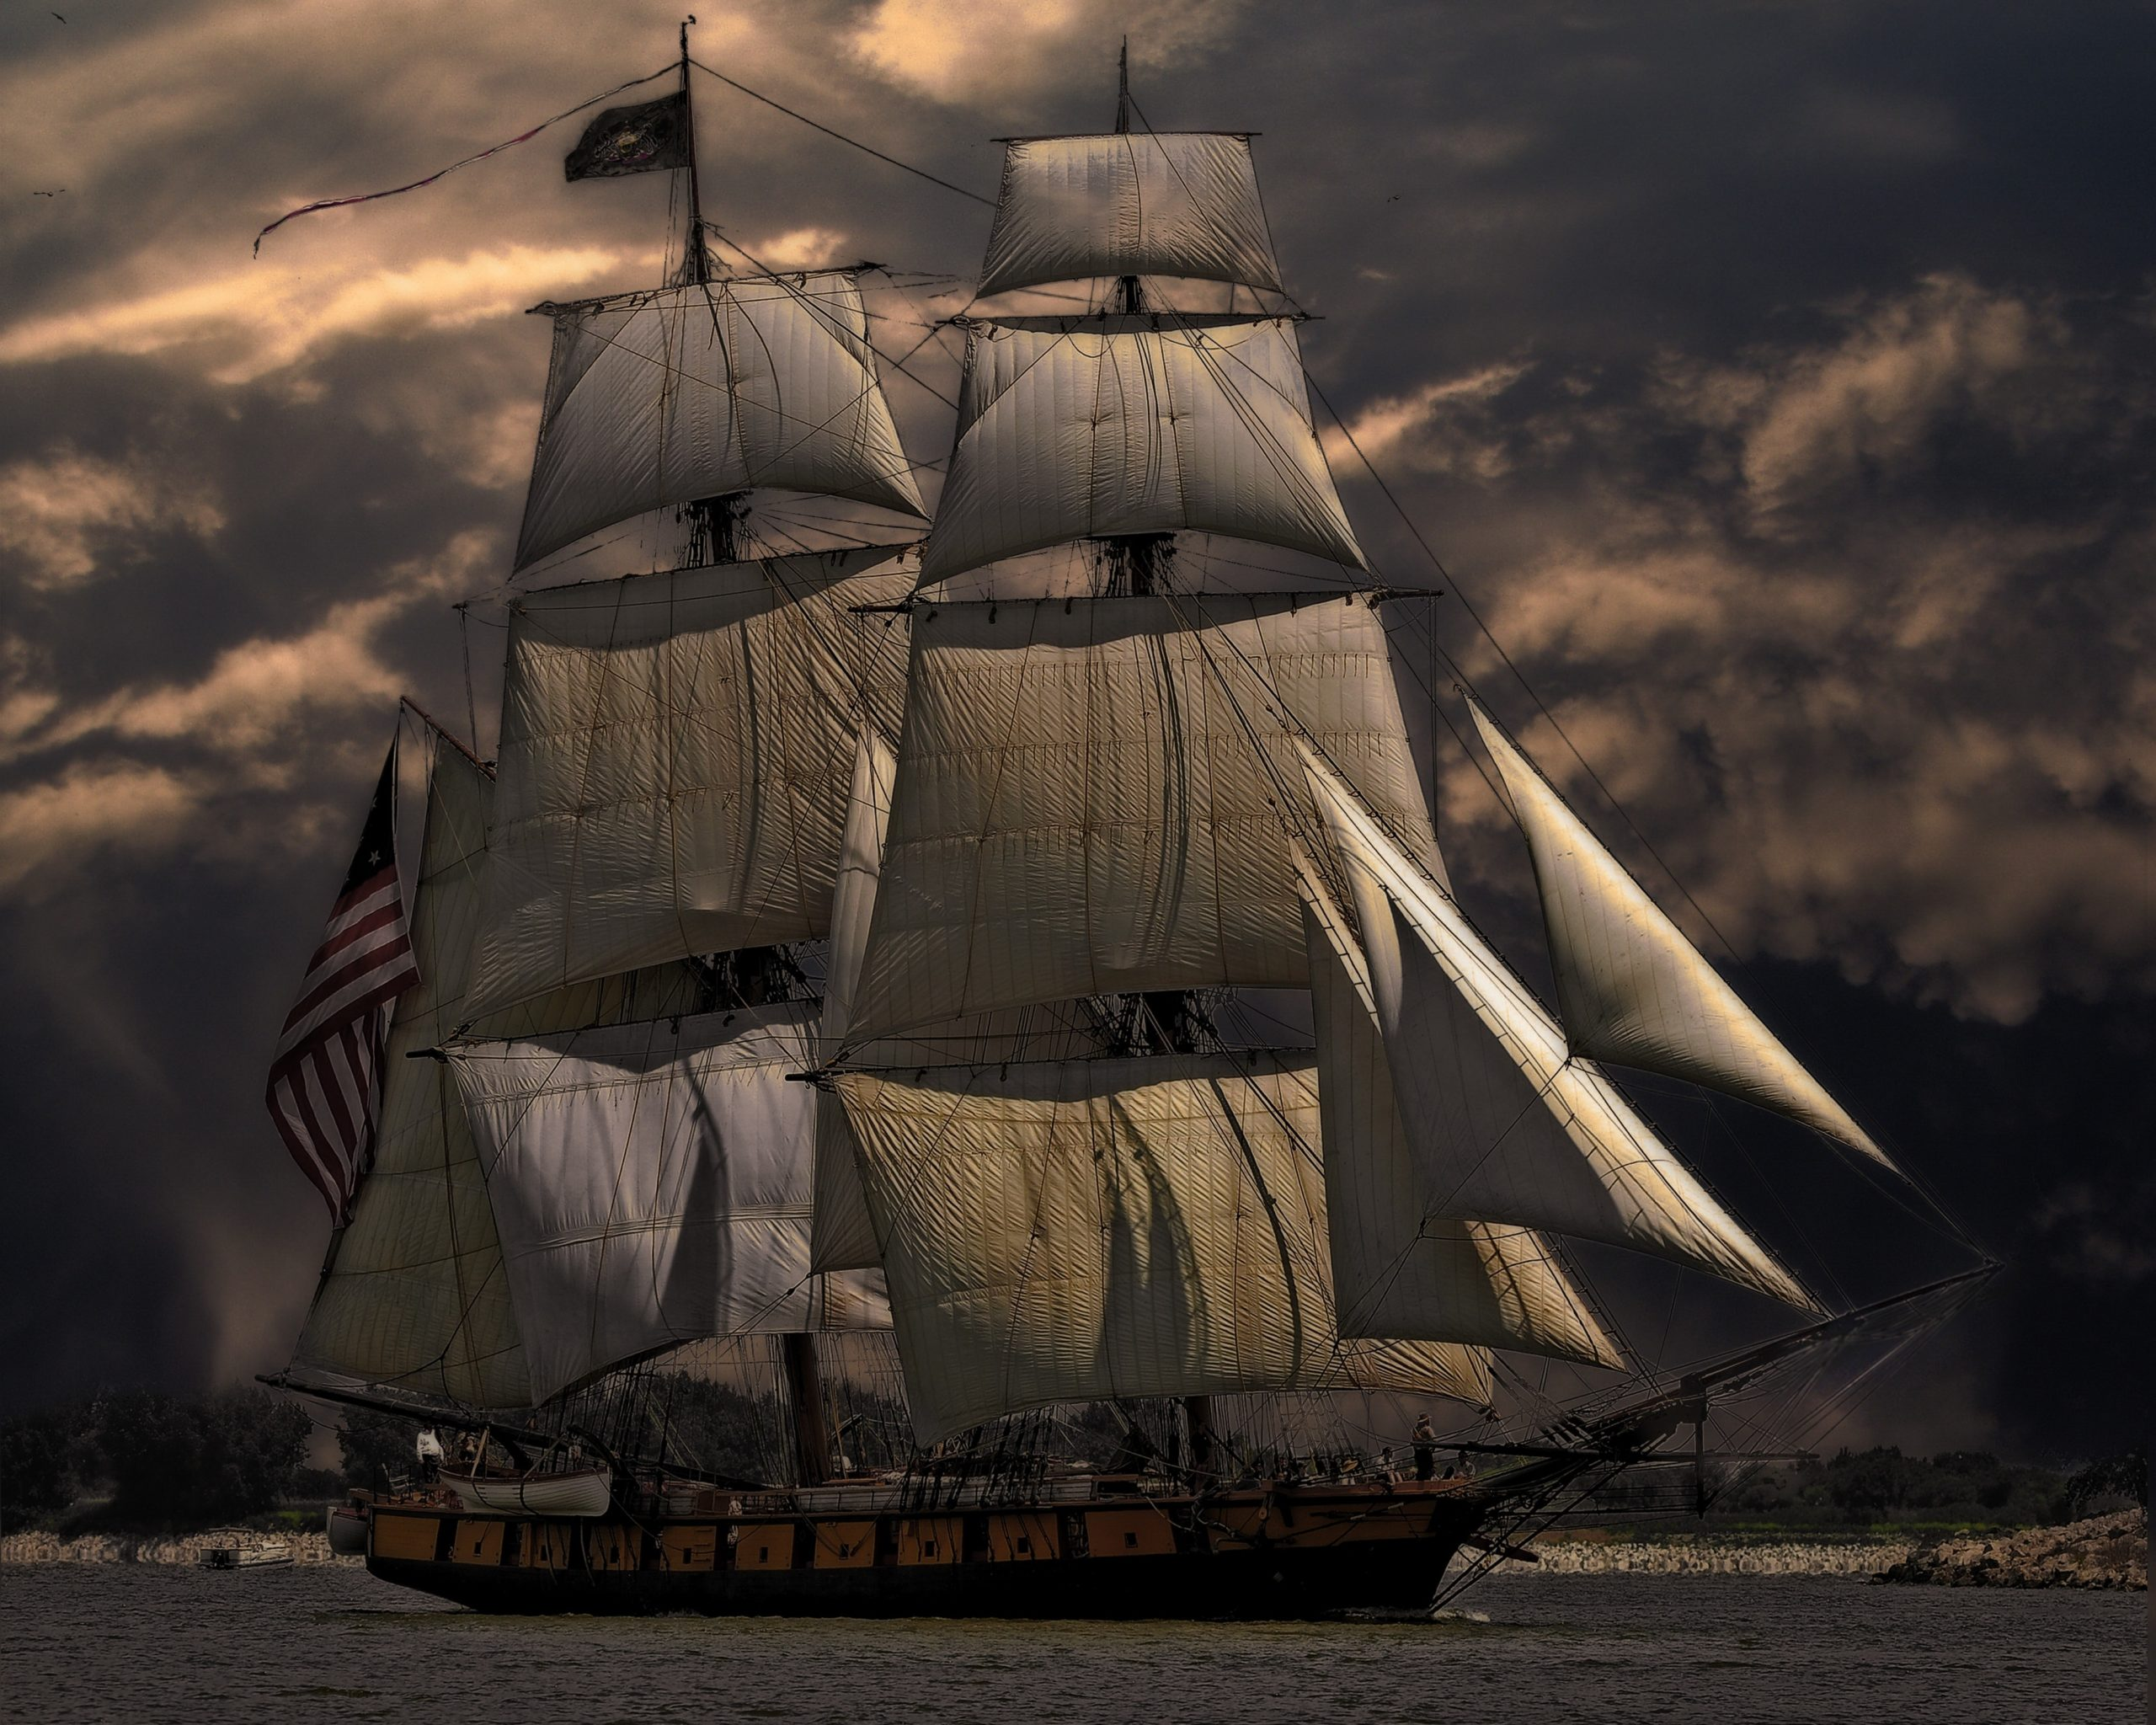 bateau de pirate barbe noire